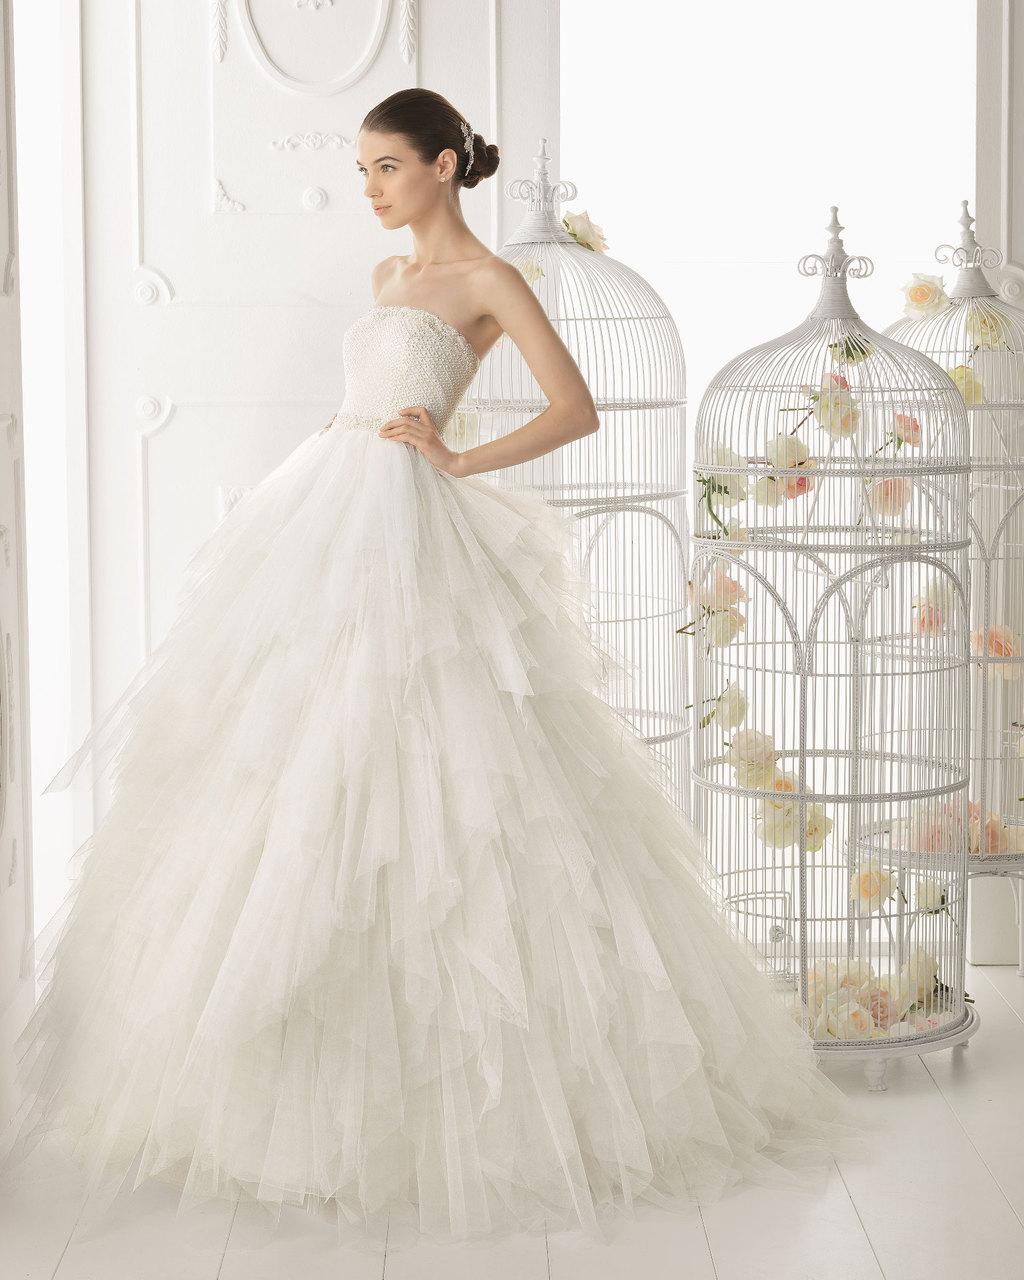 Aire-barcelona-wedding-dress-2014-bridal-ordesa.full